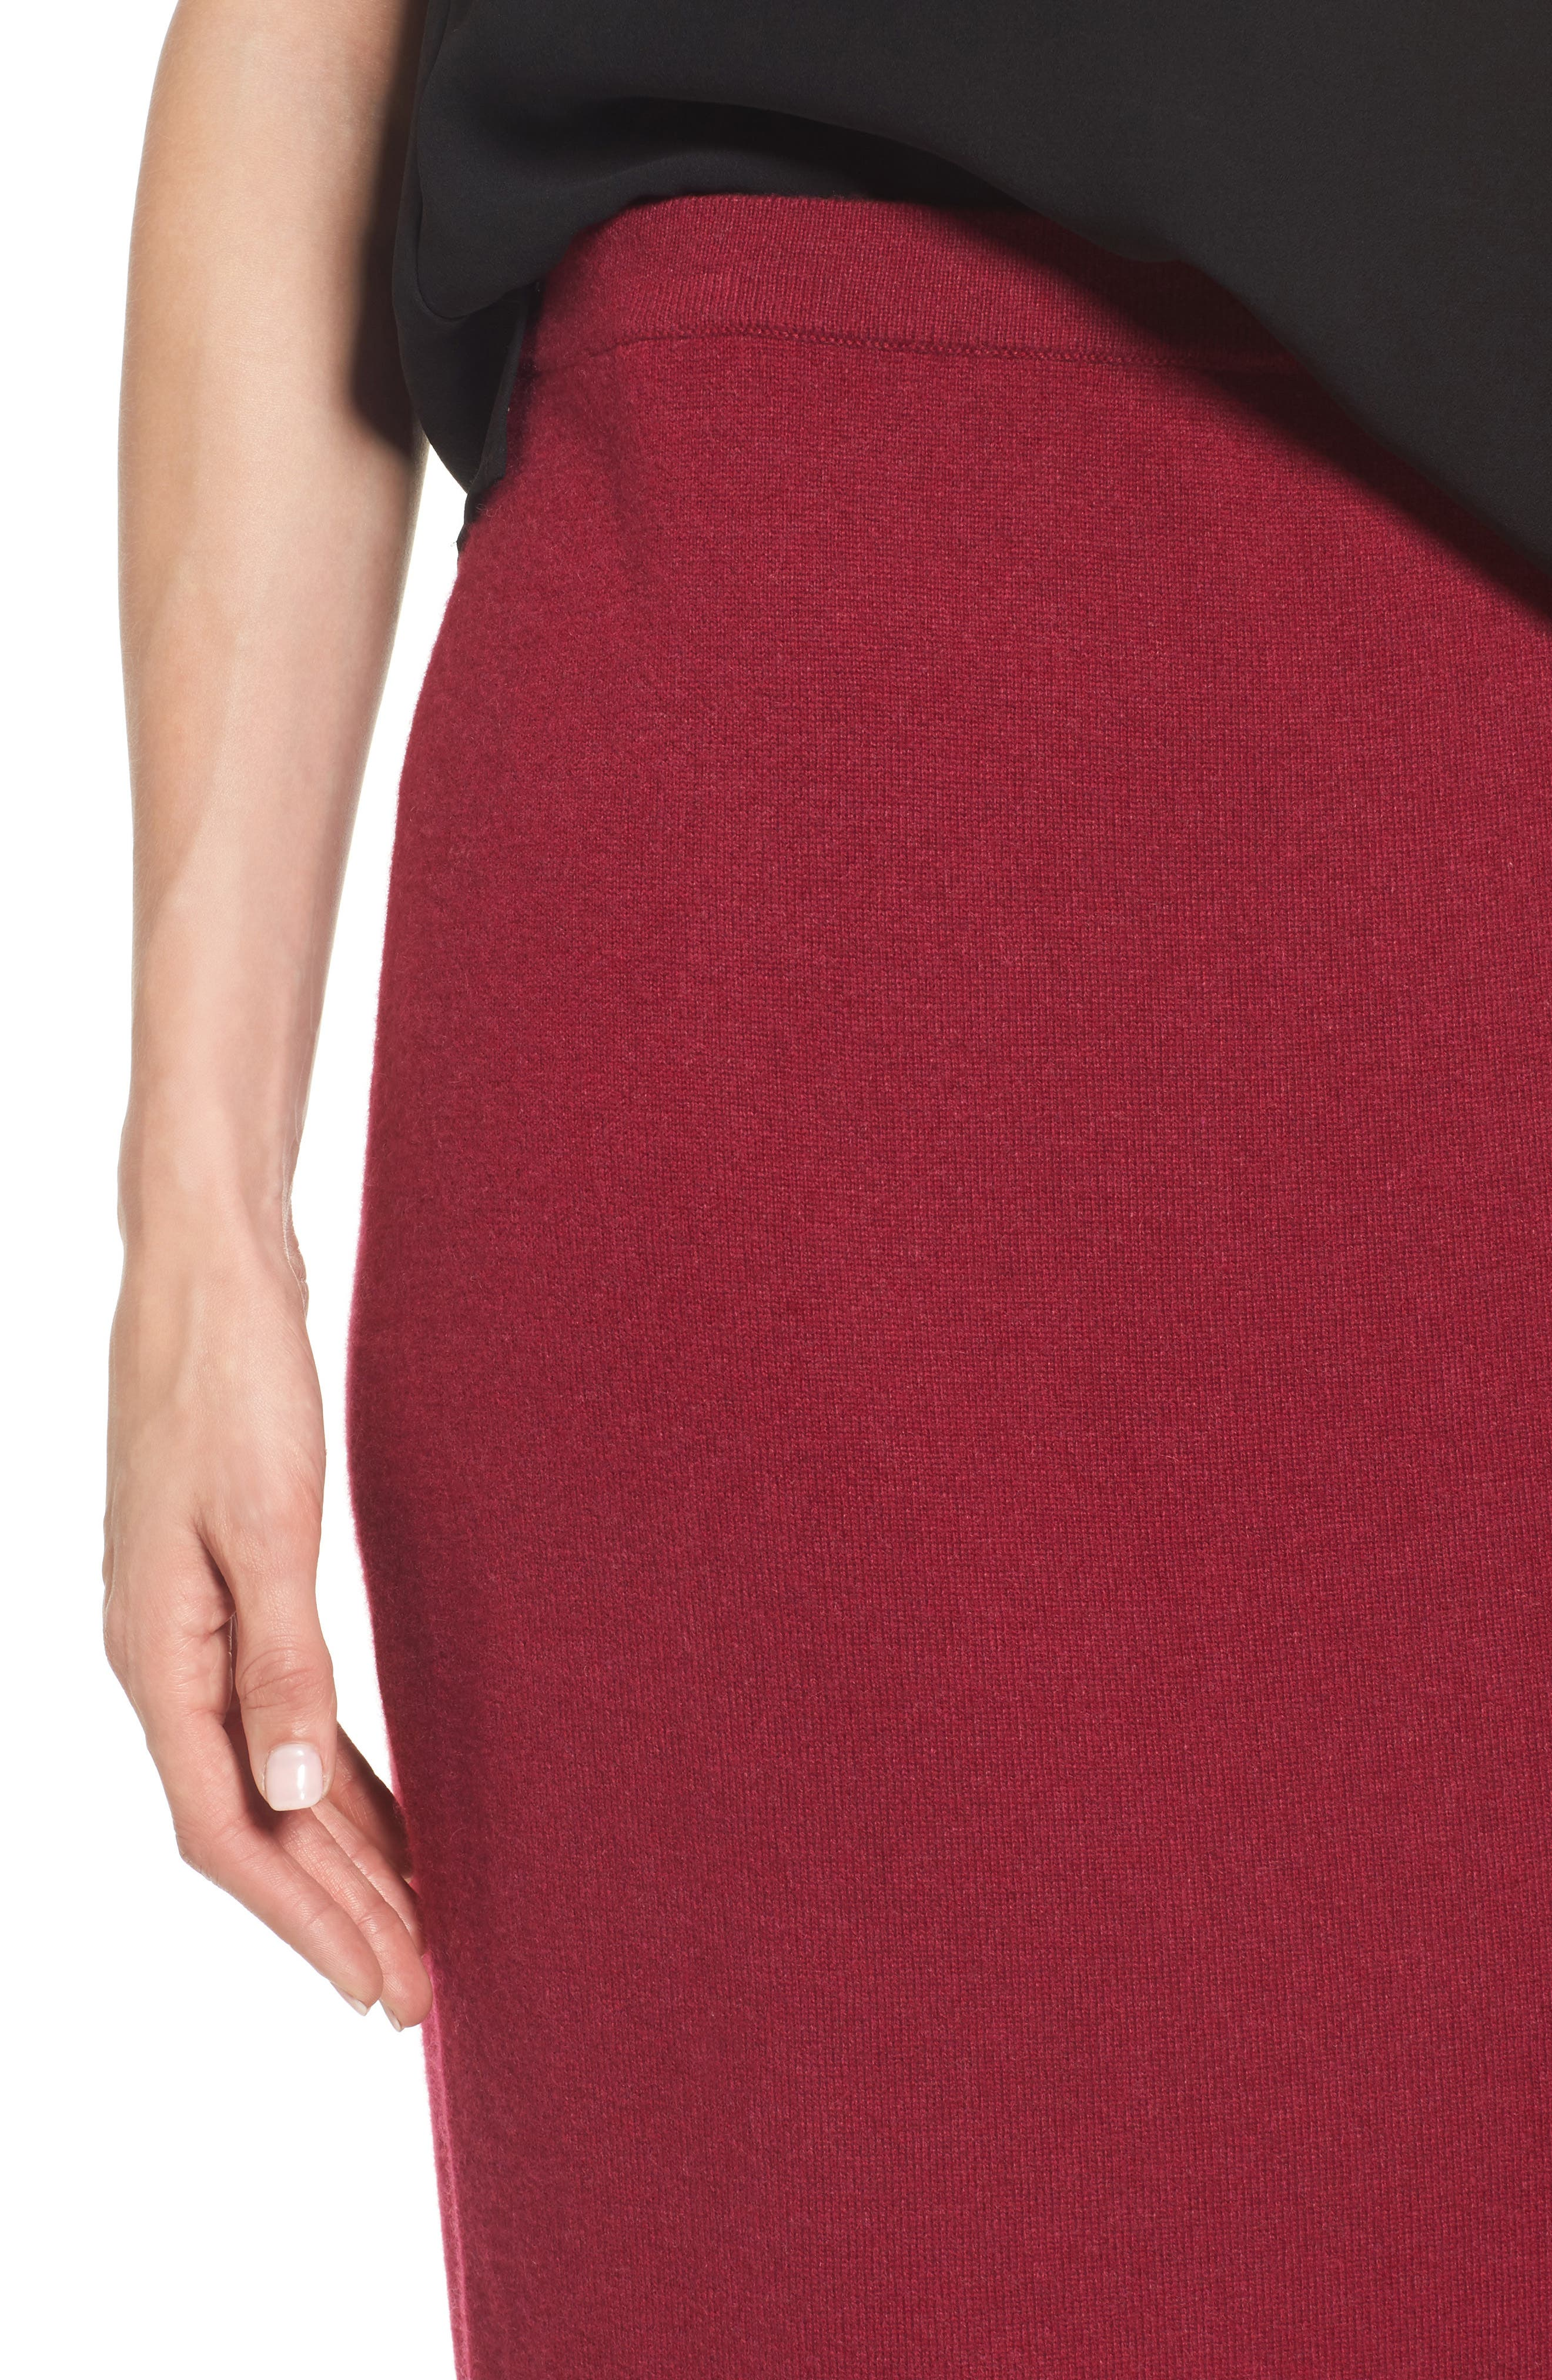 Cashmere Knit Pencil Skirt,                             Alternate thumbnail 4, color,                             Hibiscus